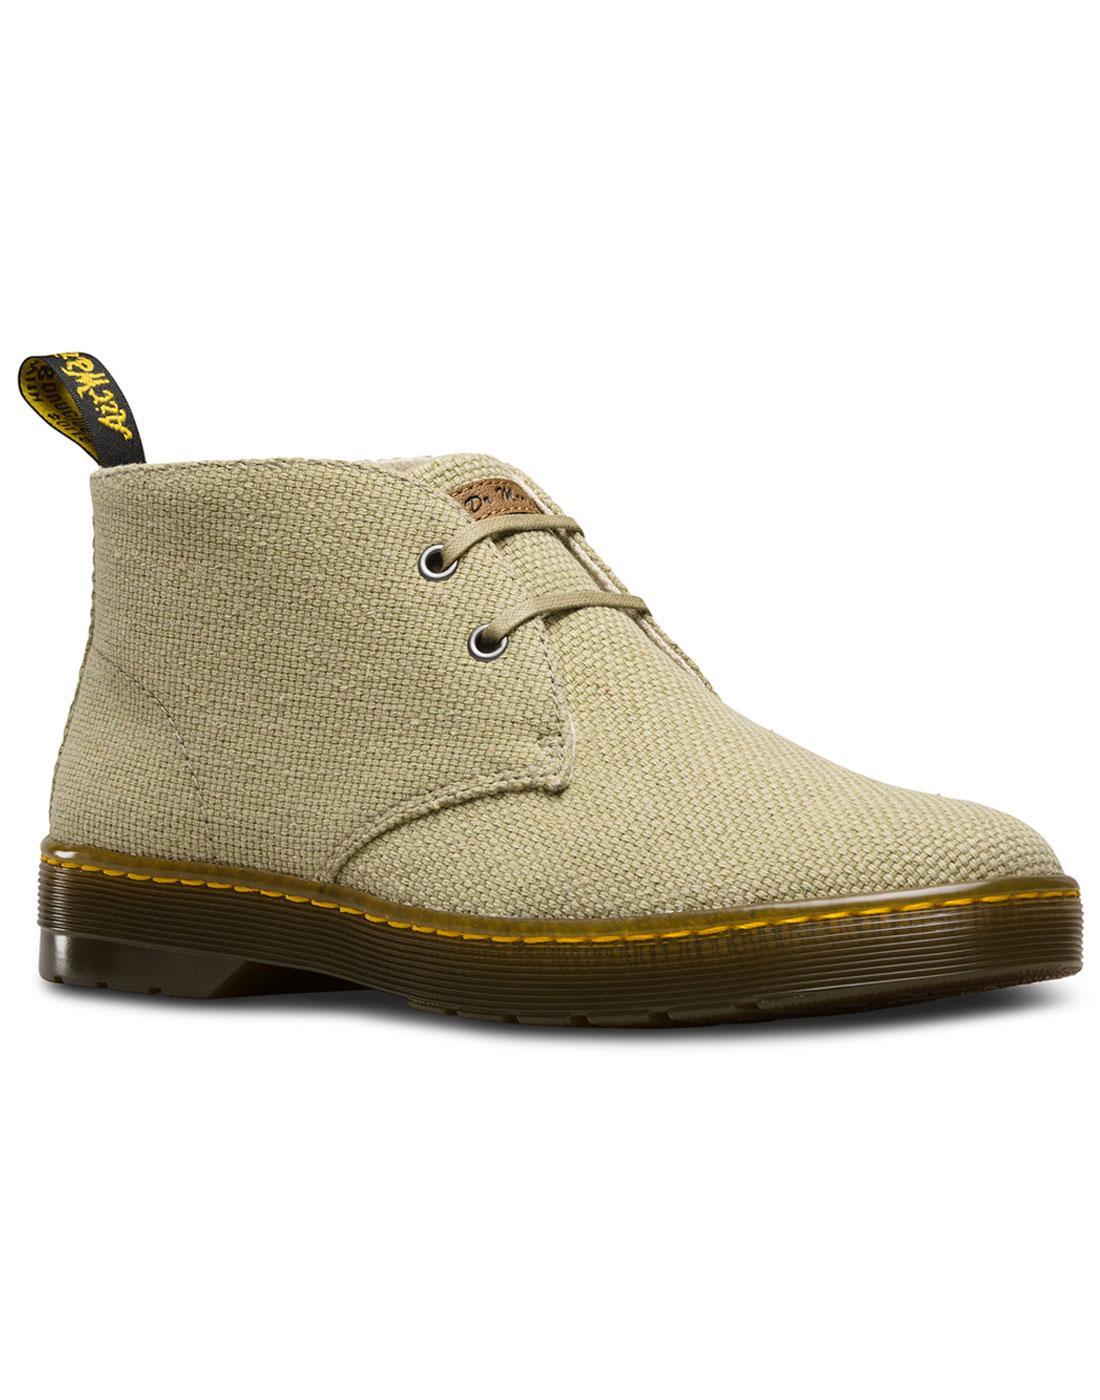 Mayport DR MARTENS Military Canvas Desert Boots OG